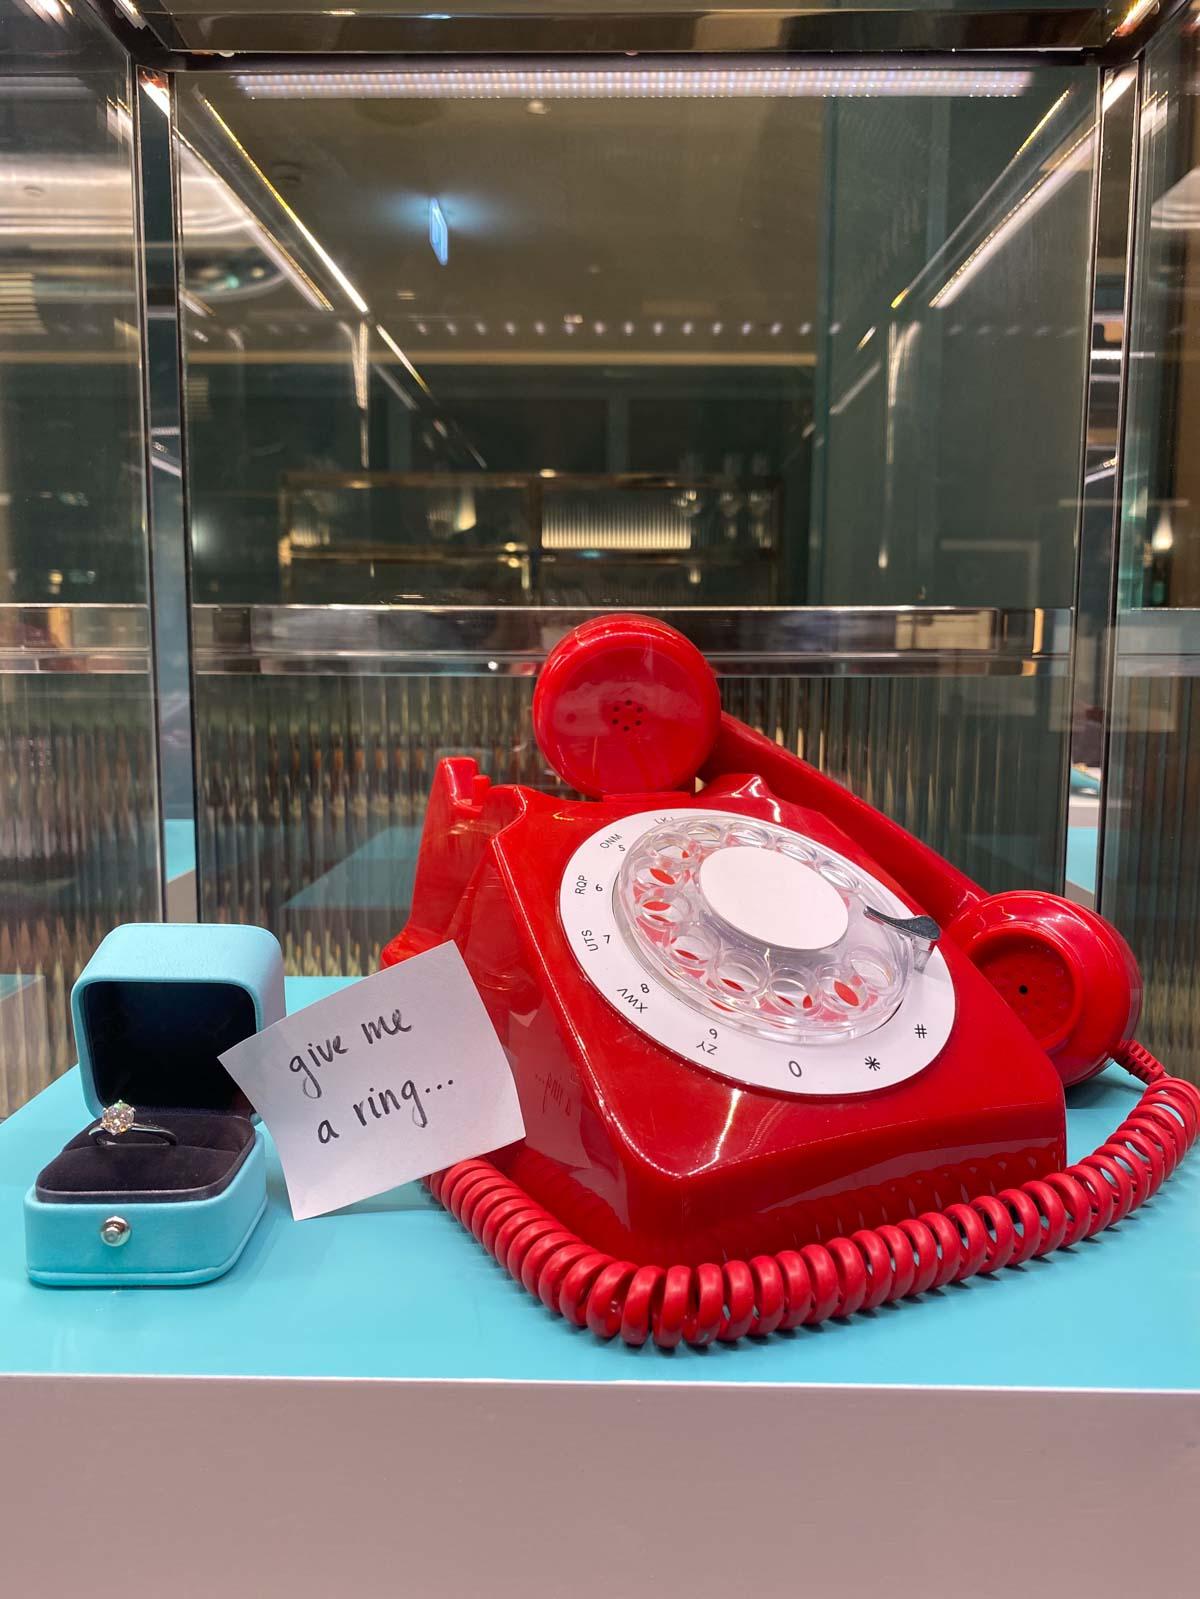 red phone at tiffany's harrods